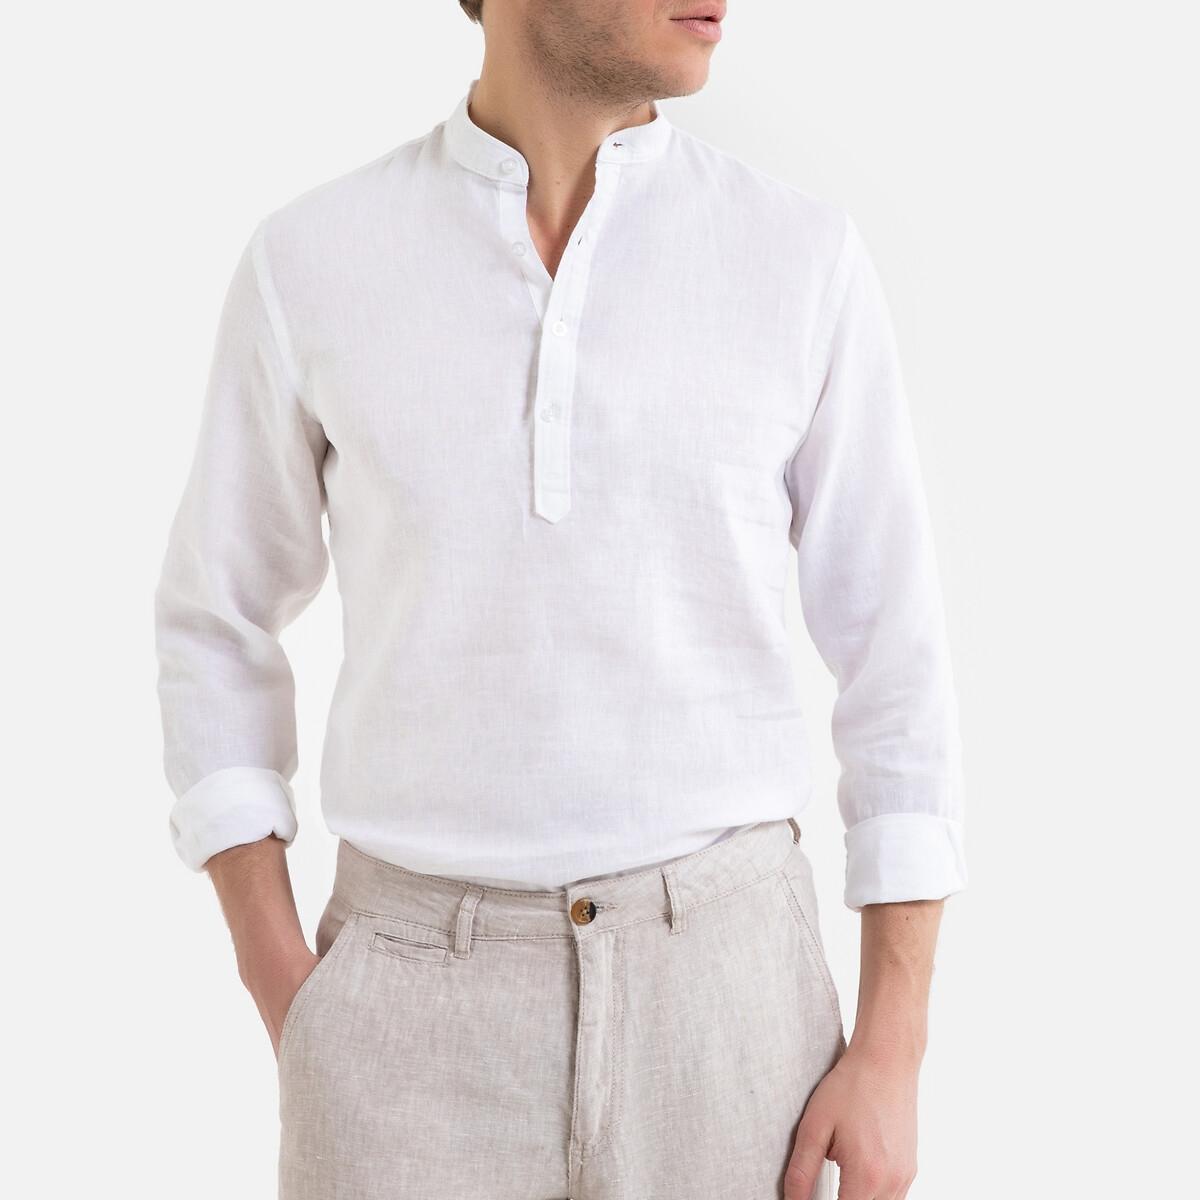 Camisa recta con cuello mao, manga larga